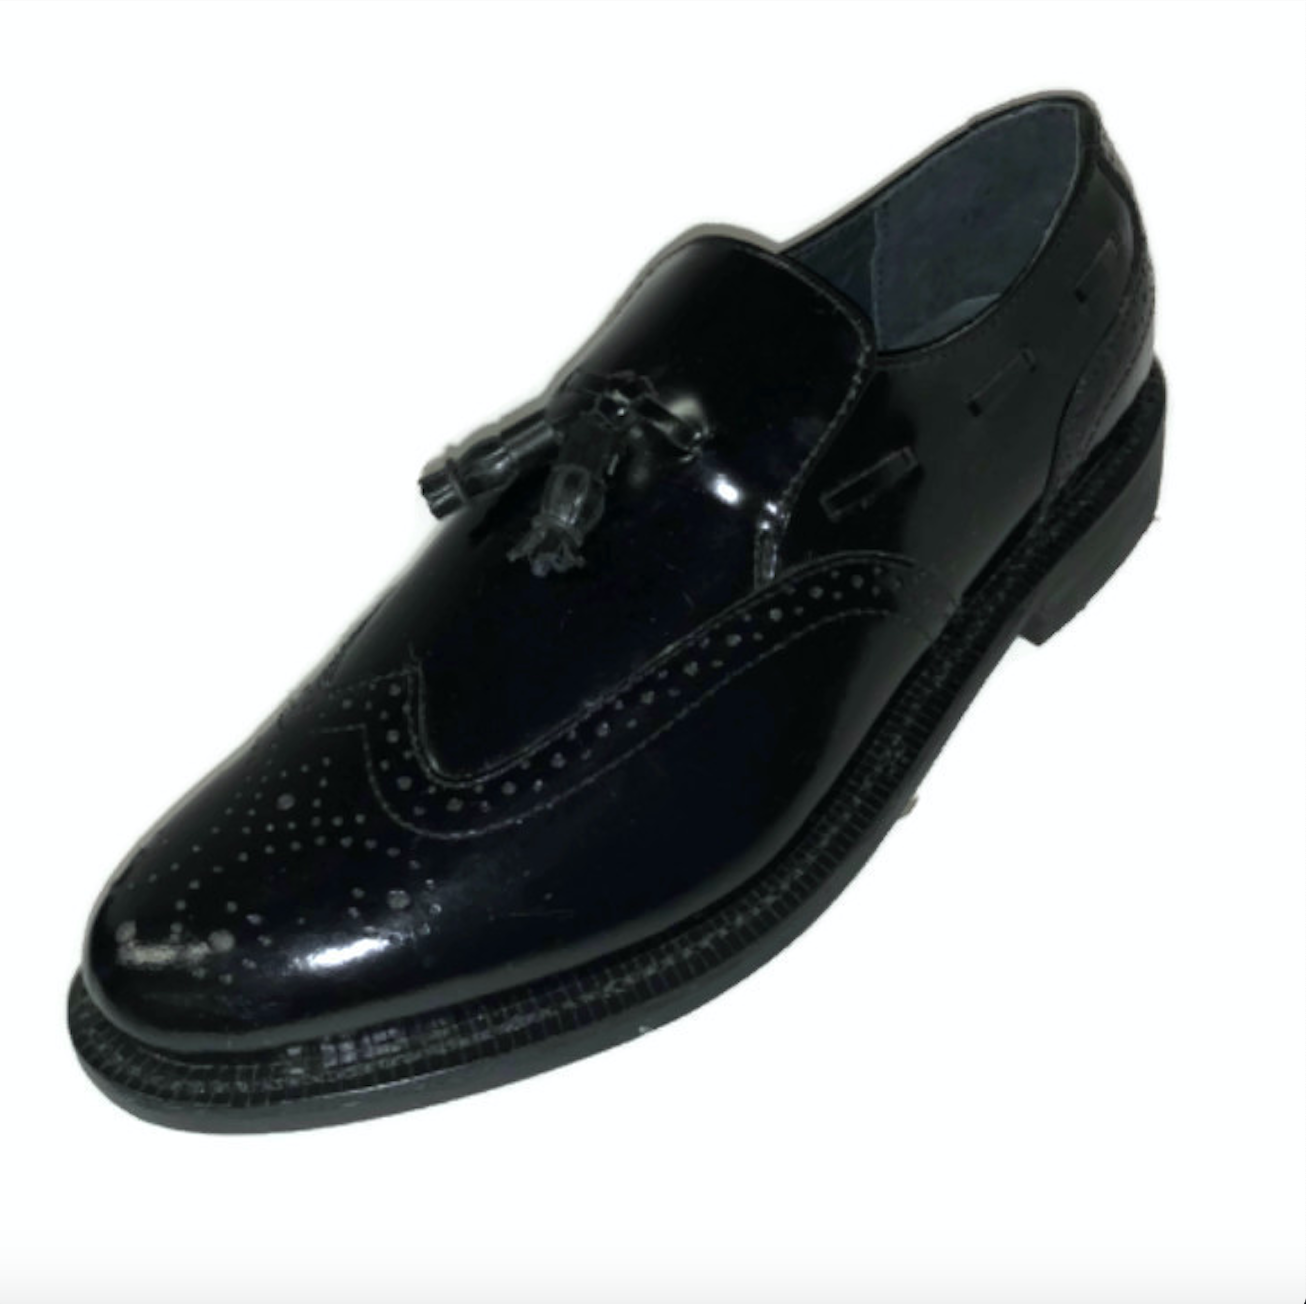 Executive Imperials 370 Tassel Wingtip Leather Black Oxford shoes Mens Sz 12 D